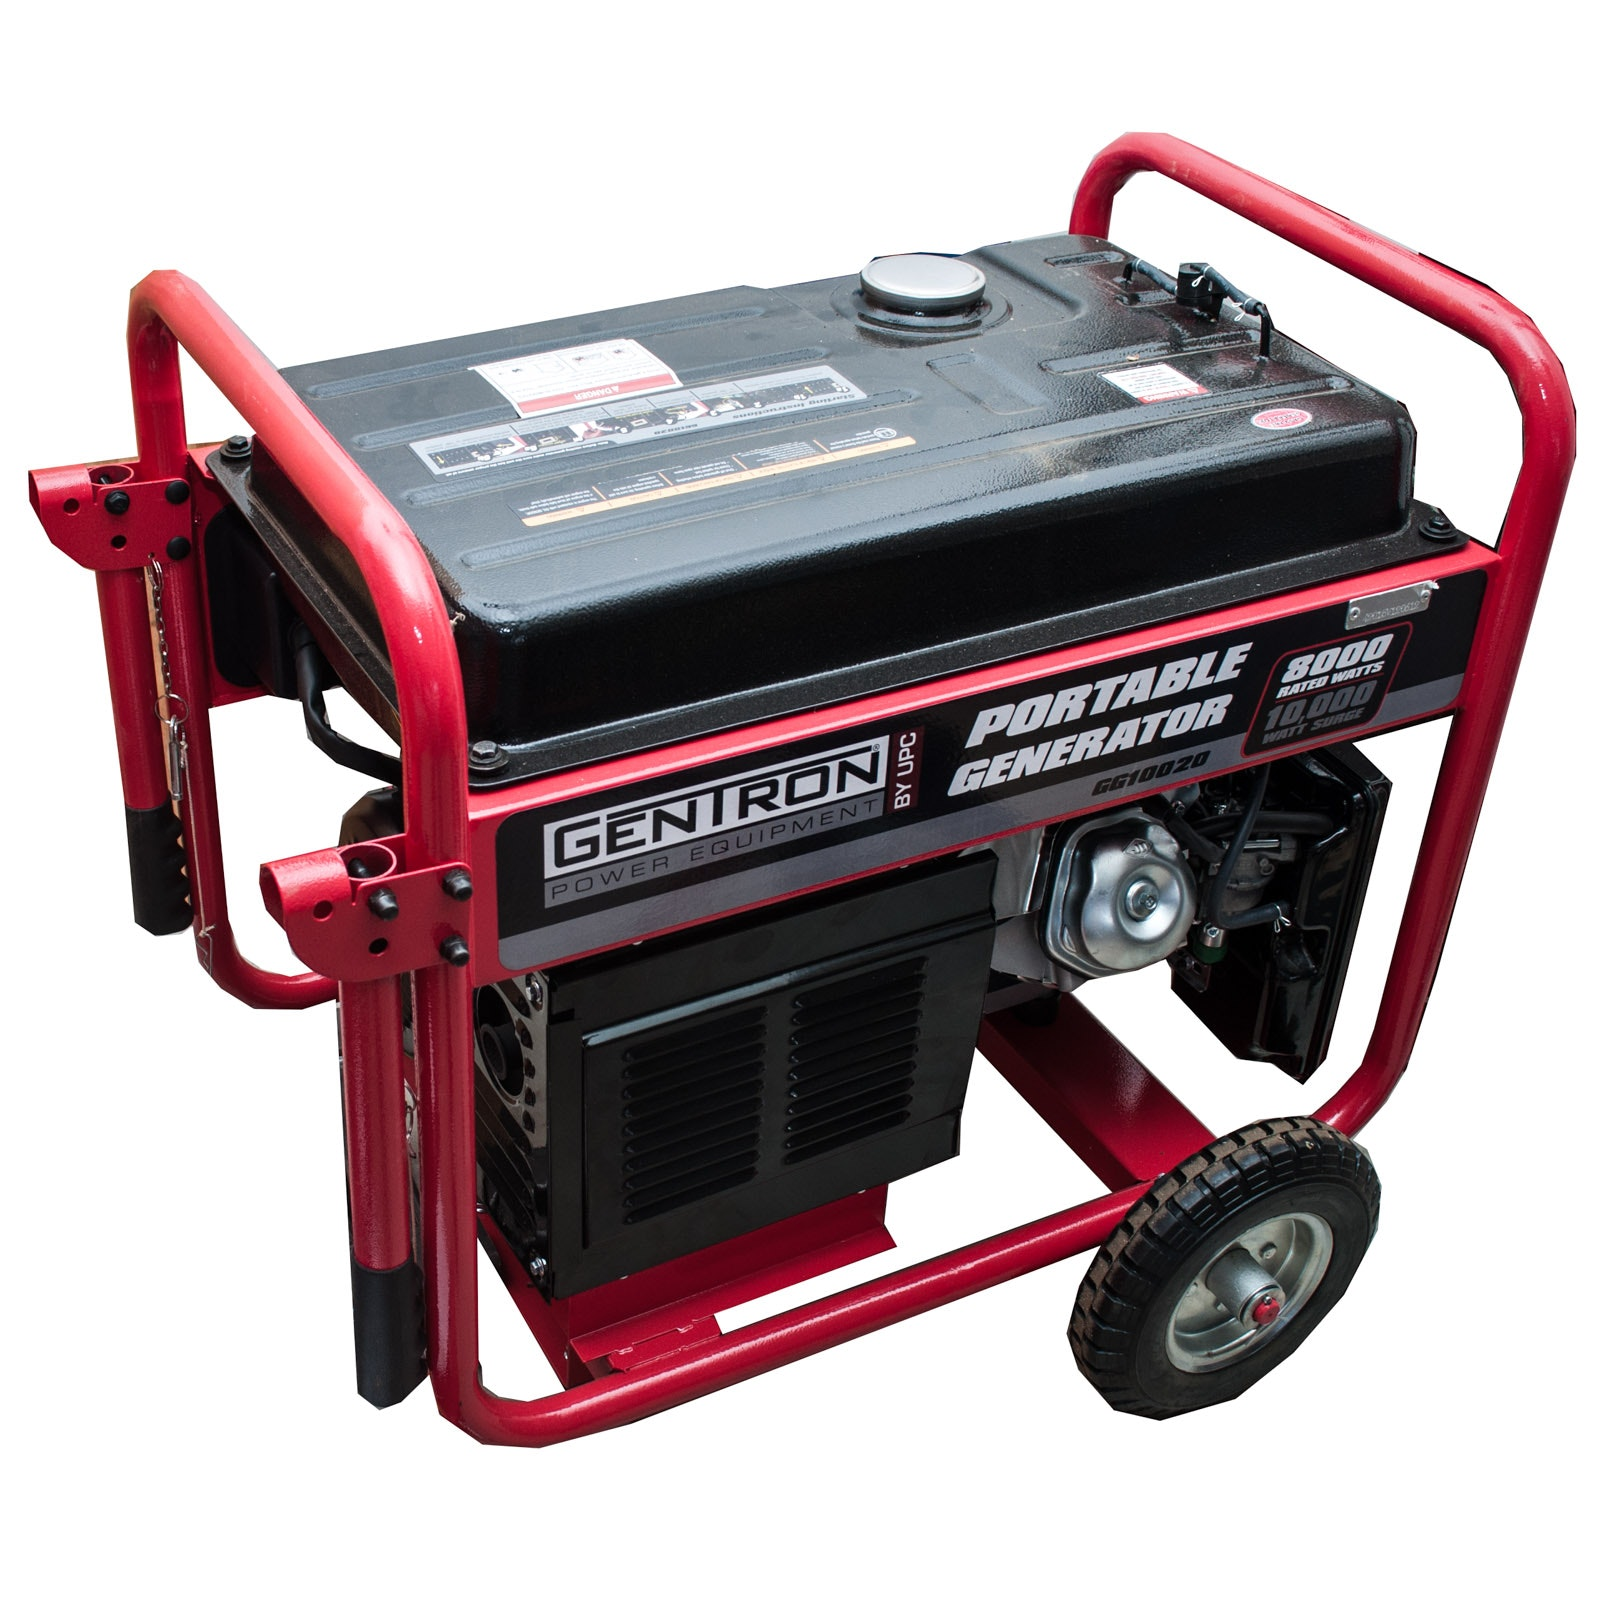 GenTron 10,000 Watt Portable Gasoline Generator